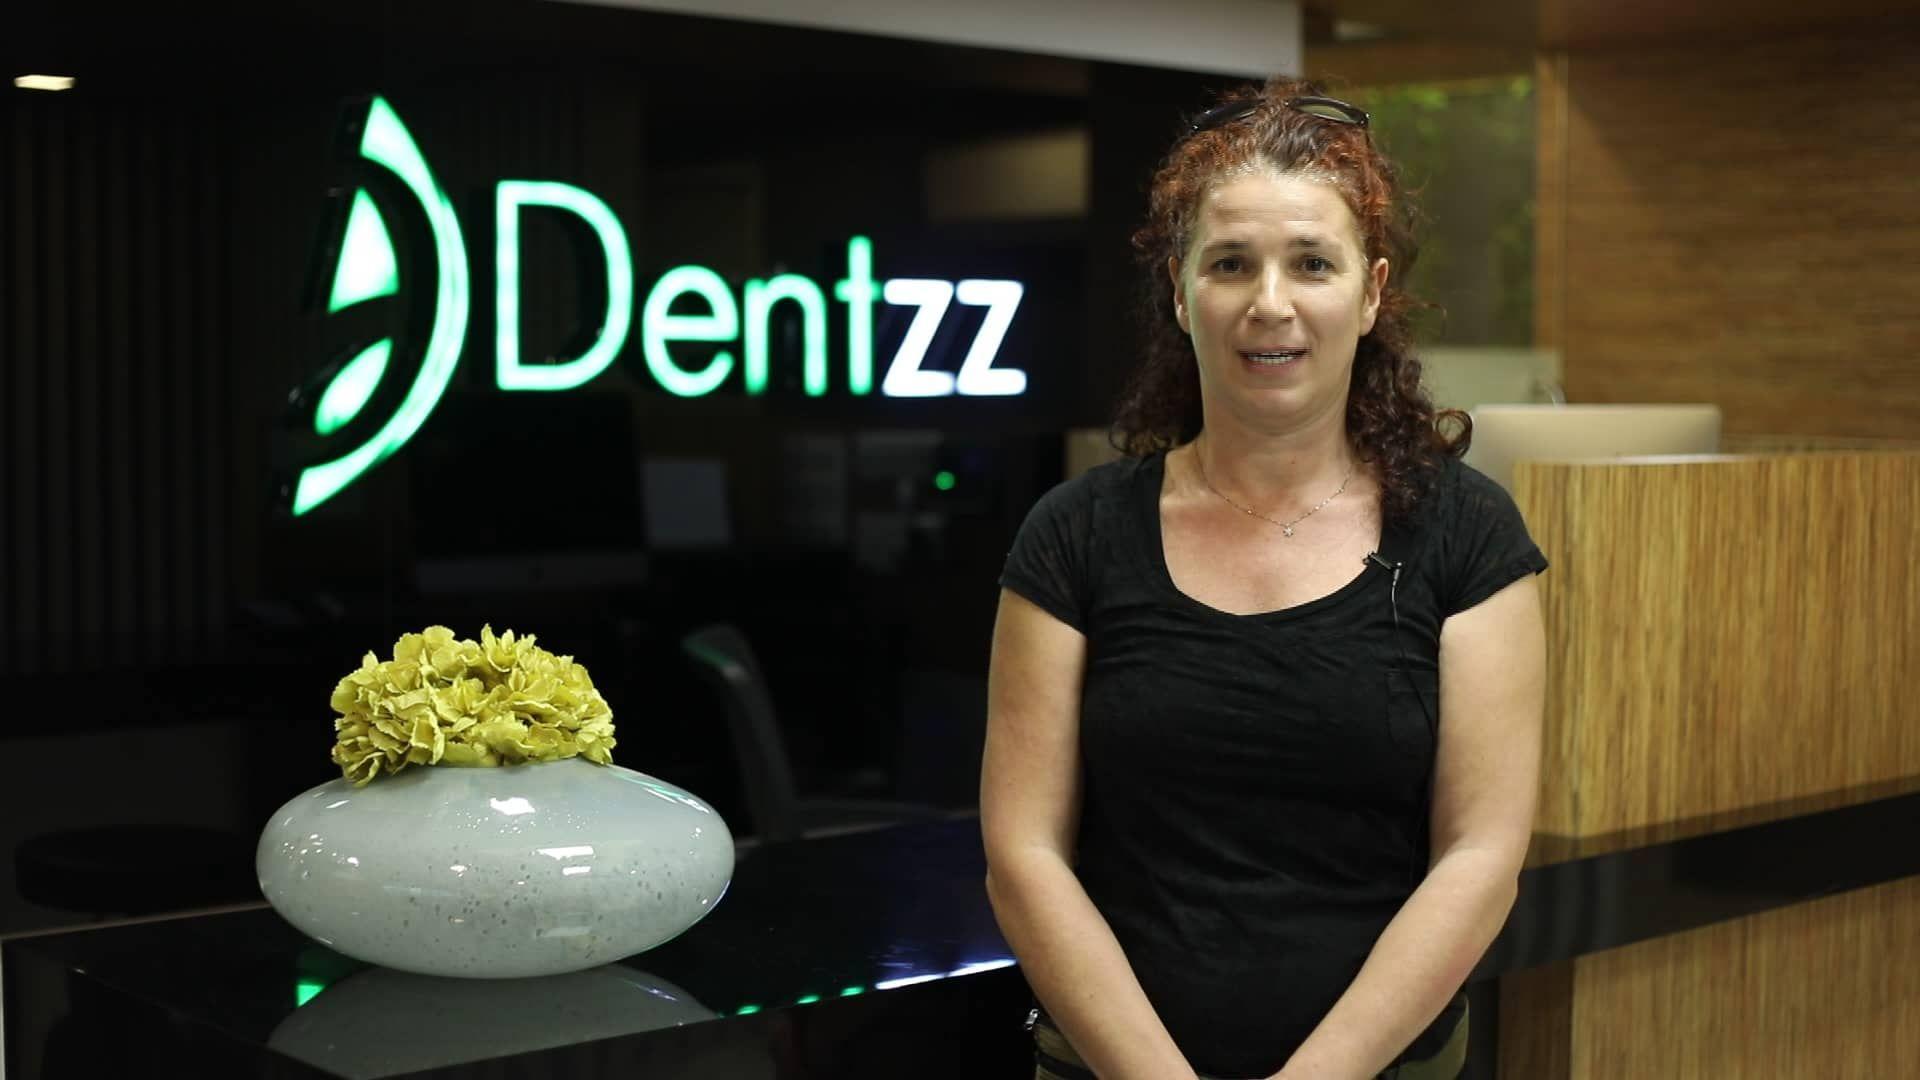 Dentzz Reviews by Barbara Cinelli from Australia (With